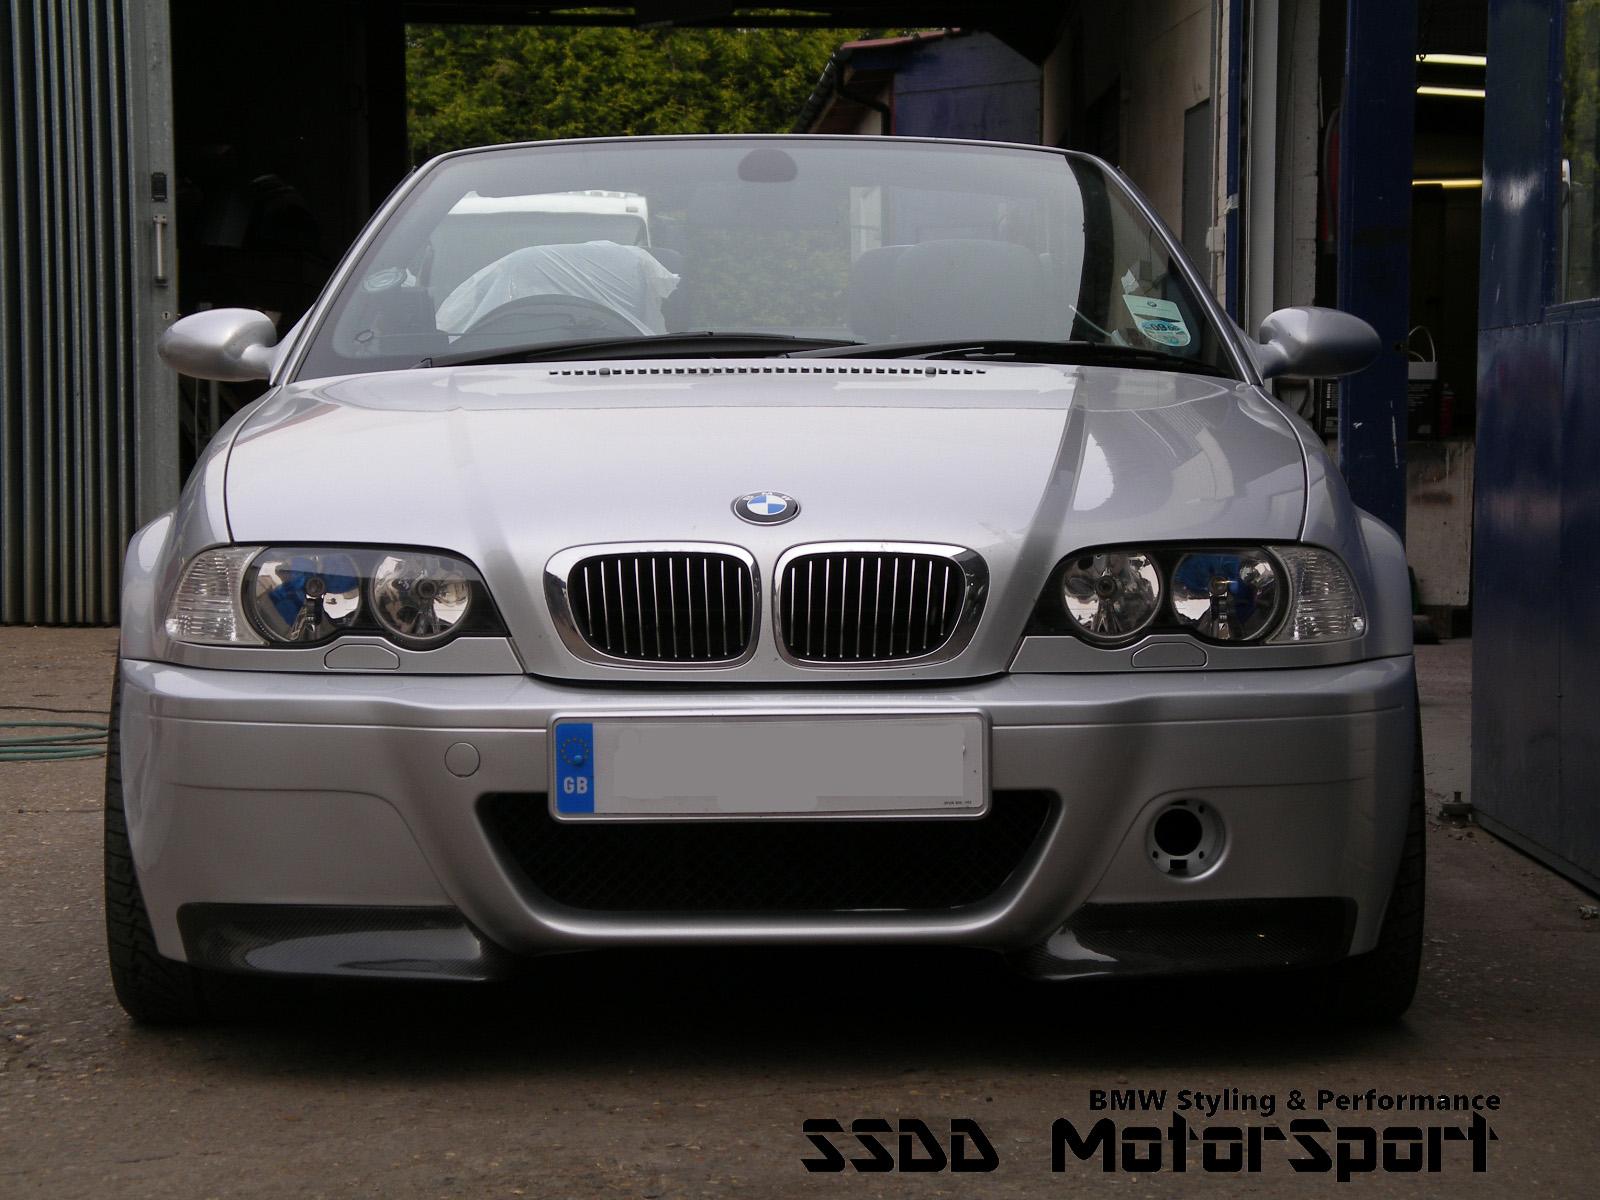 bmw-e46-m3-csl-bumper-coupe-convertible-non-m3-1.jpg